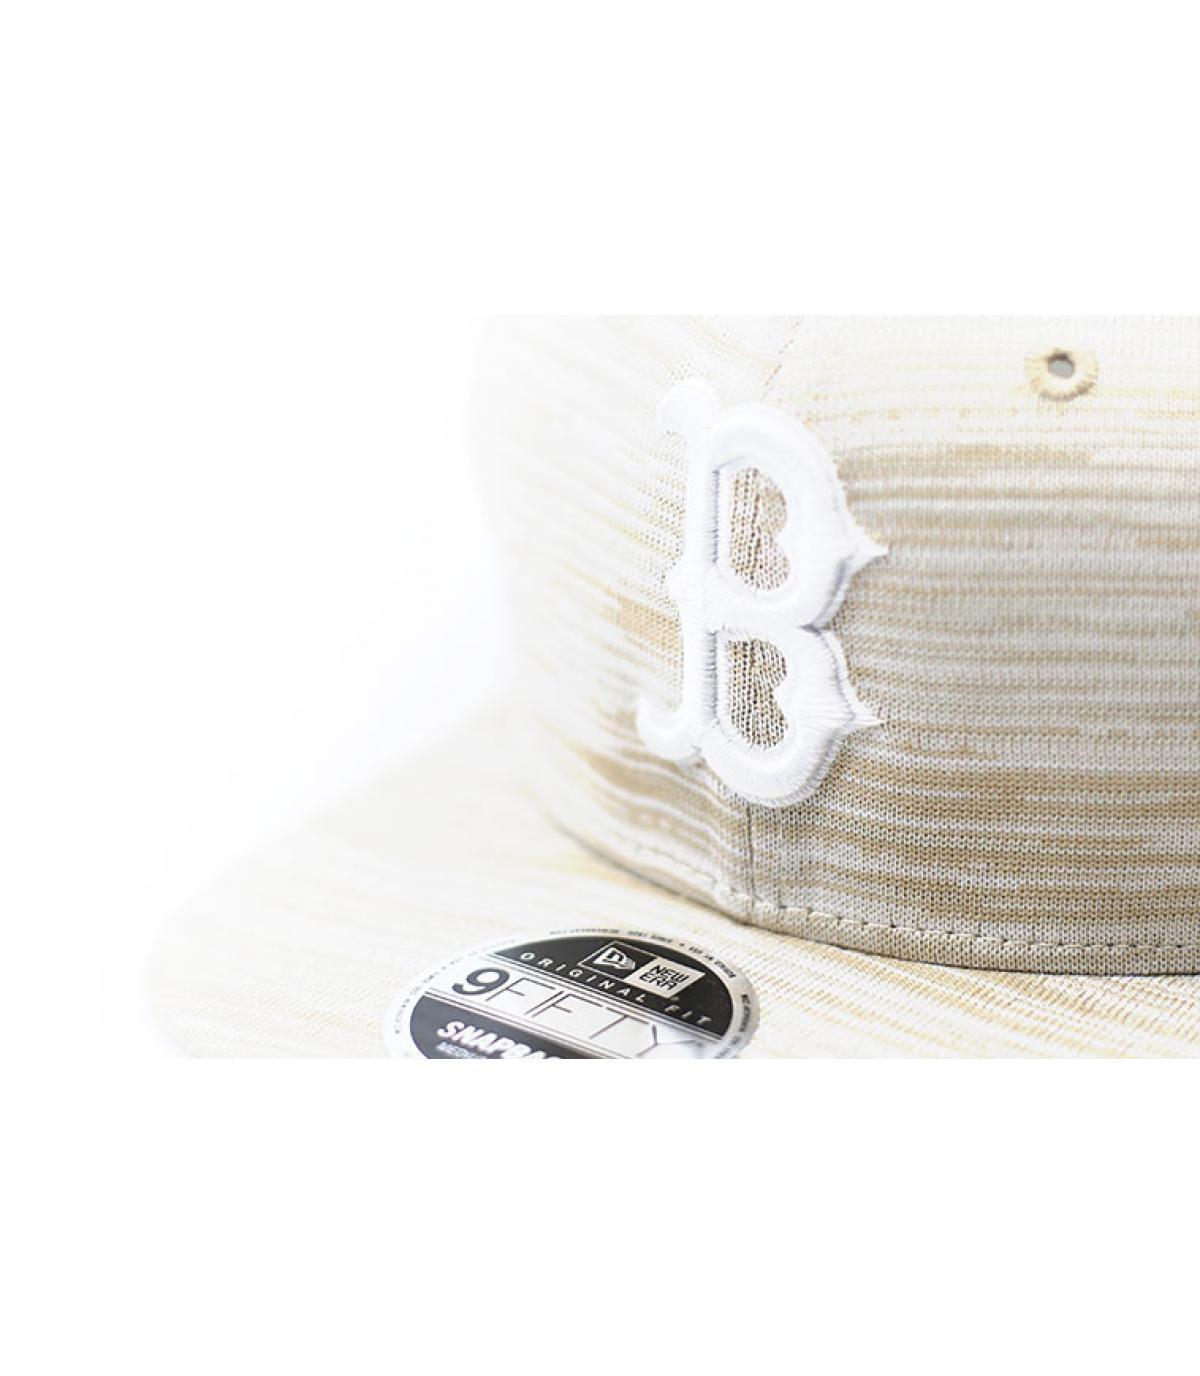 Detalles Engineered Fit 9Fifty Boston stone white imagen 3